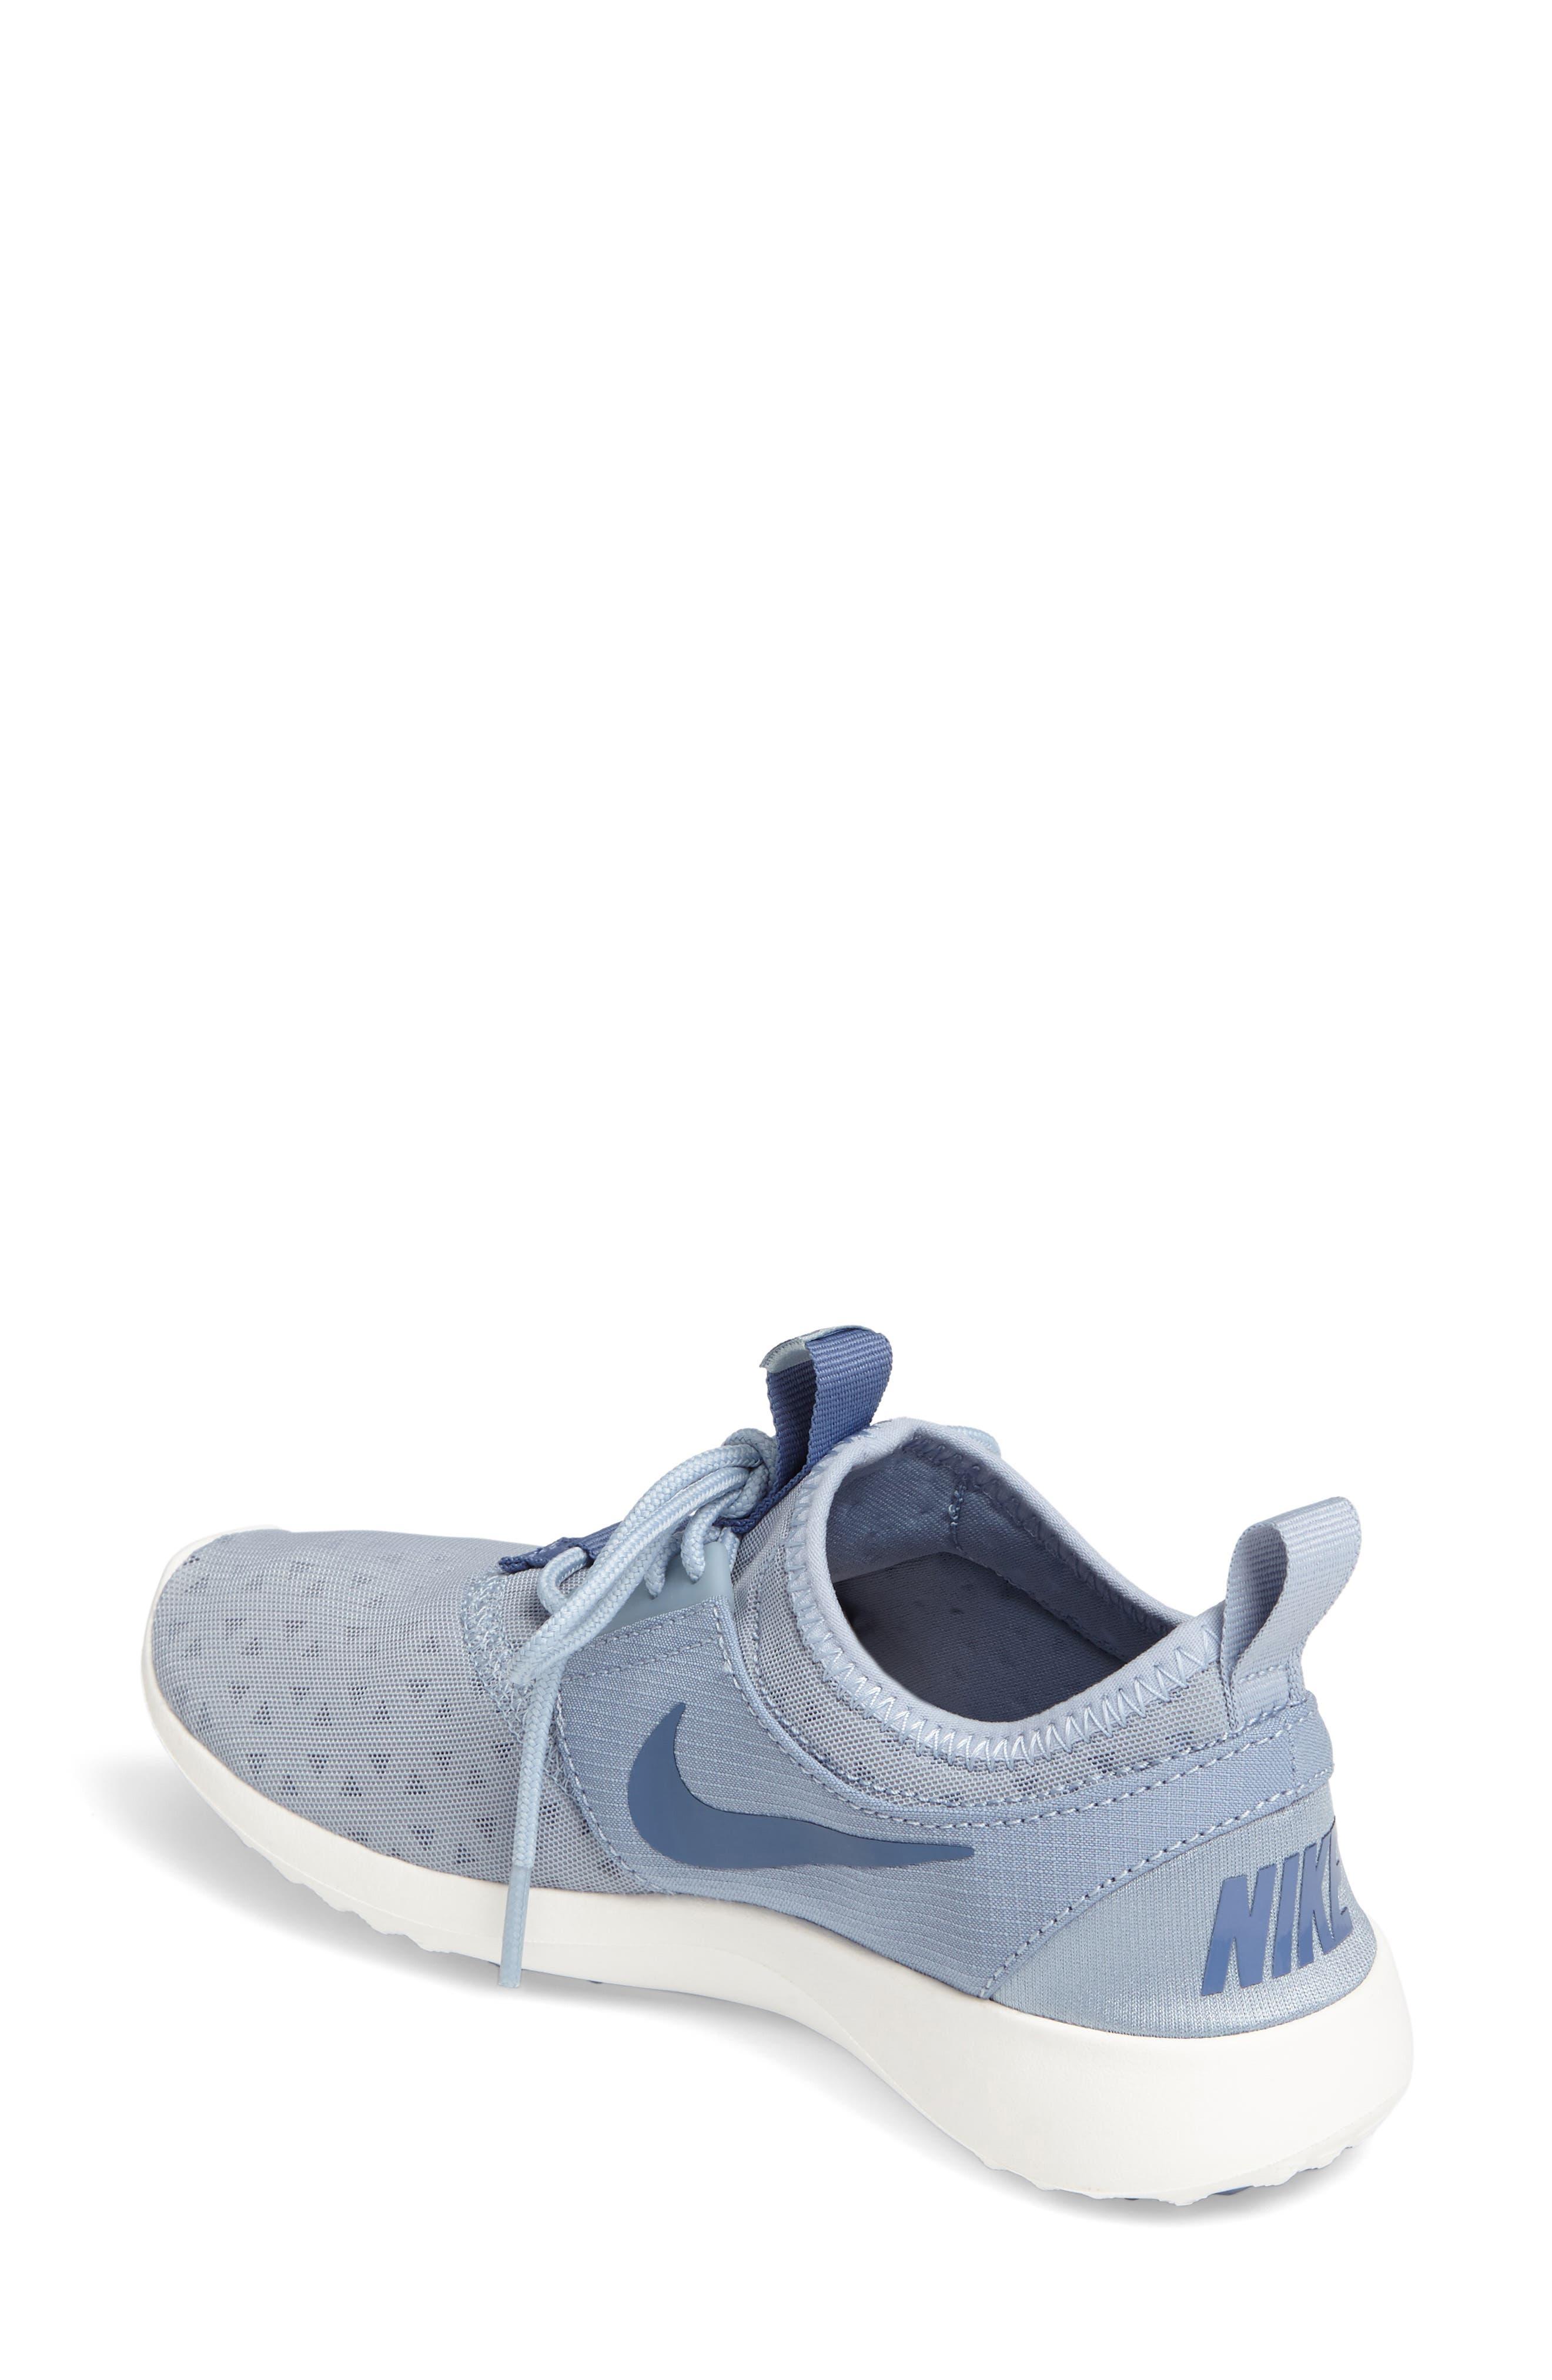 ,                             'Juvenate' Sneaker,                             Alternate thumbnail 229, color,                             406